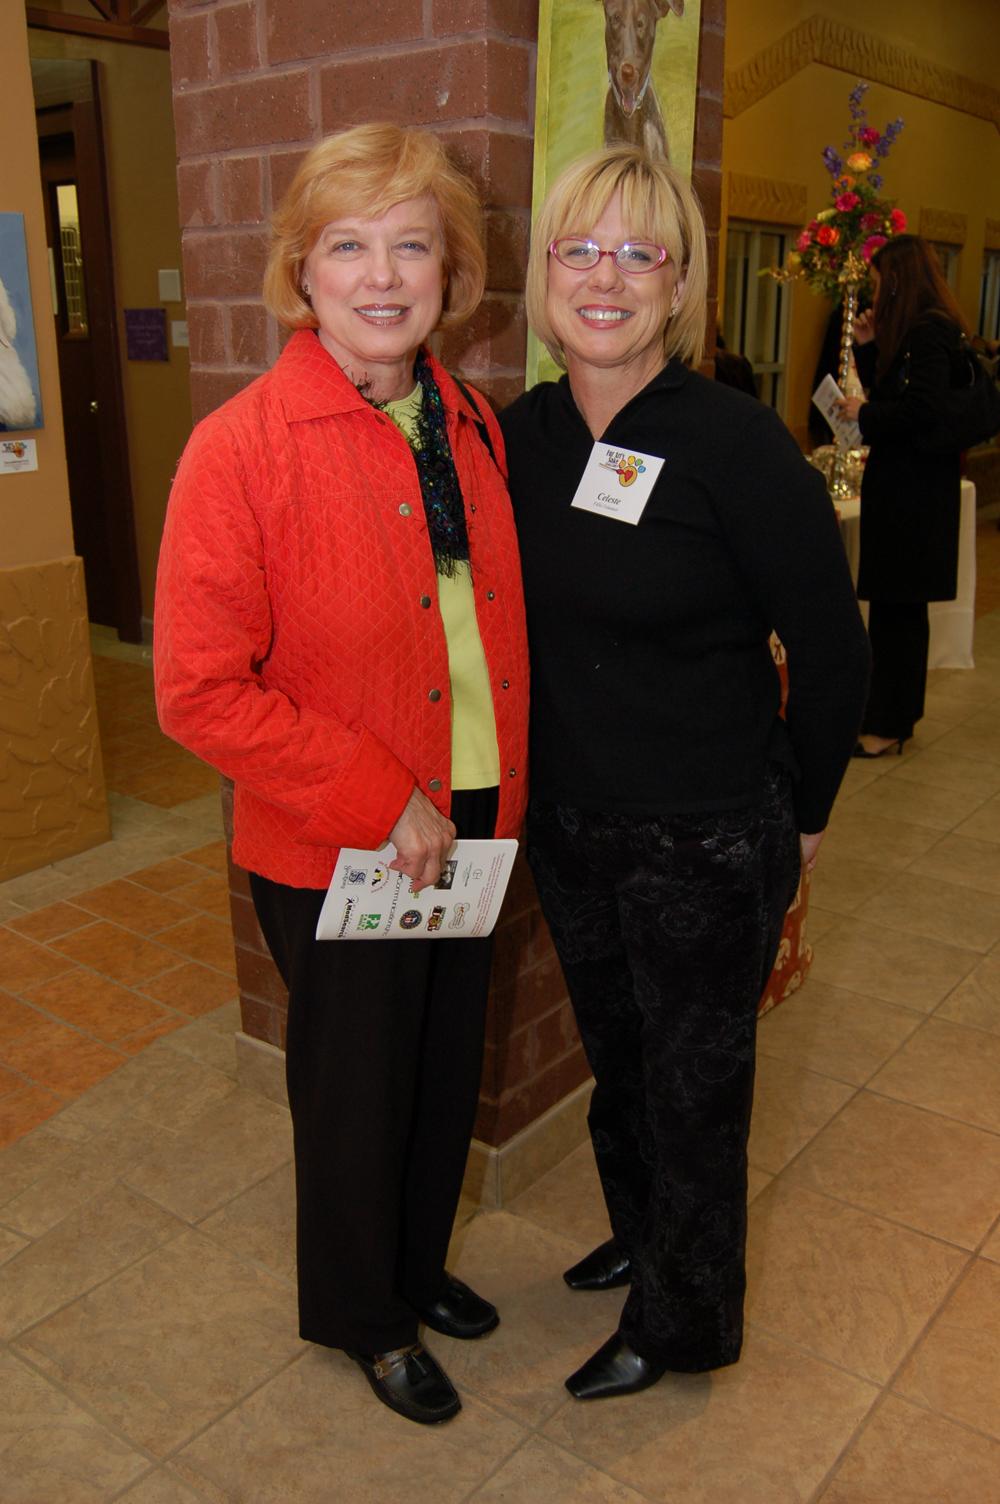 Cheryl Schoenfeld and Celeste David